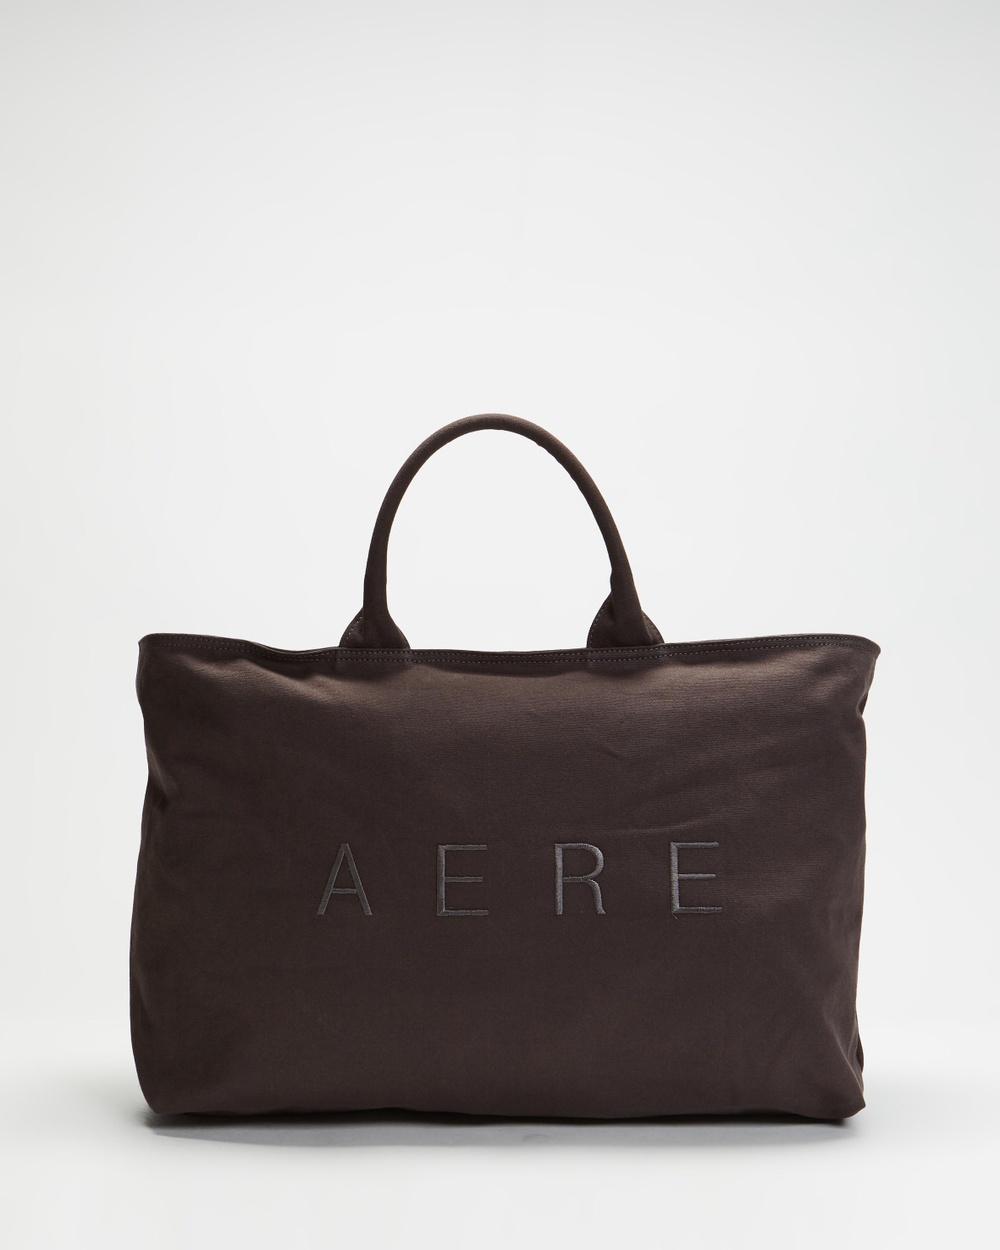 AERE Organic Canvas Zip Tote Beach Bags Charcoal Black